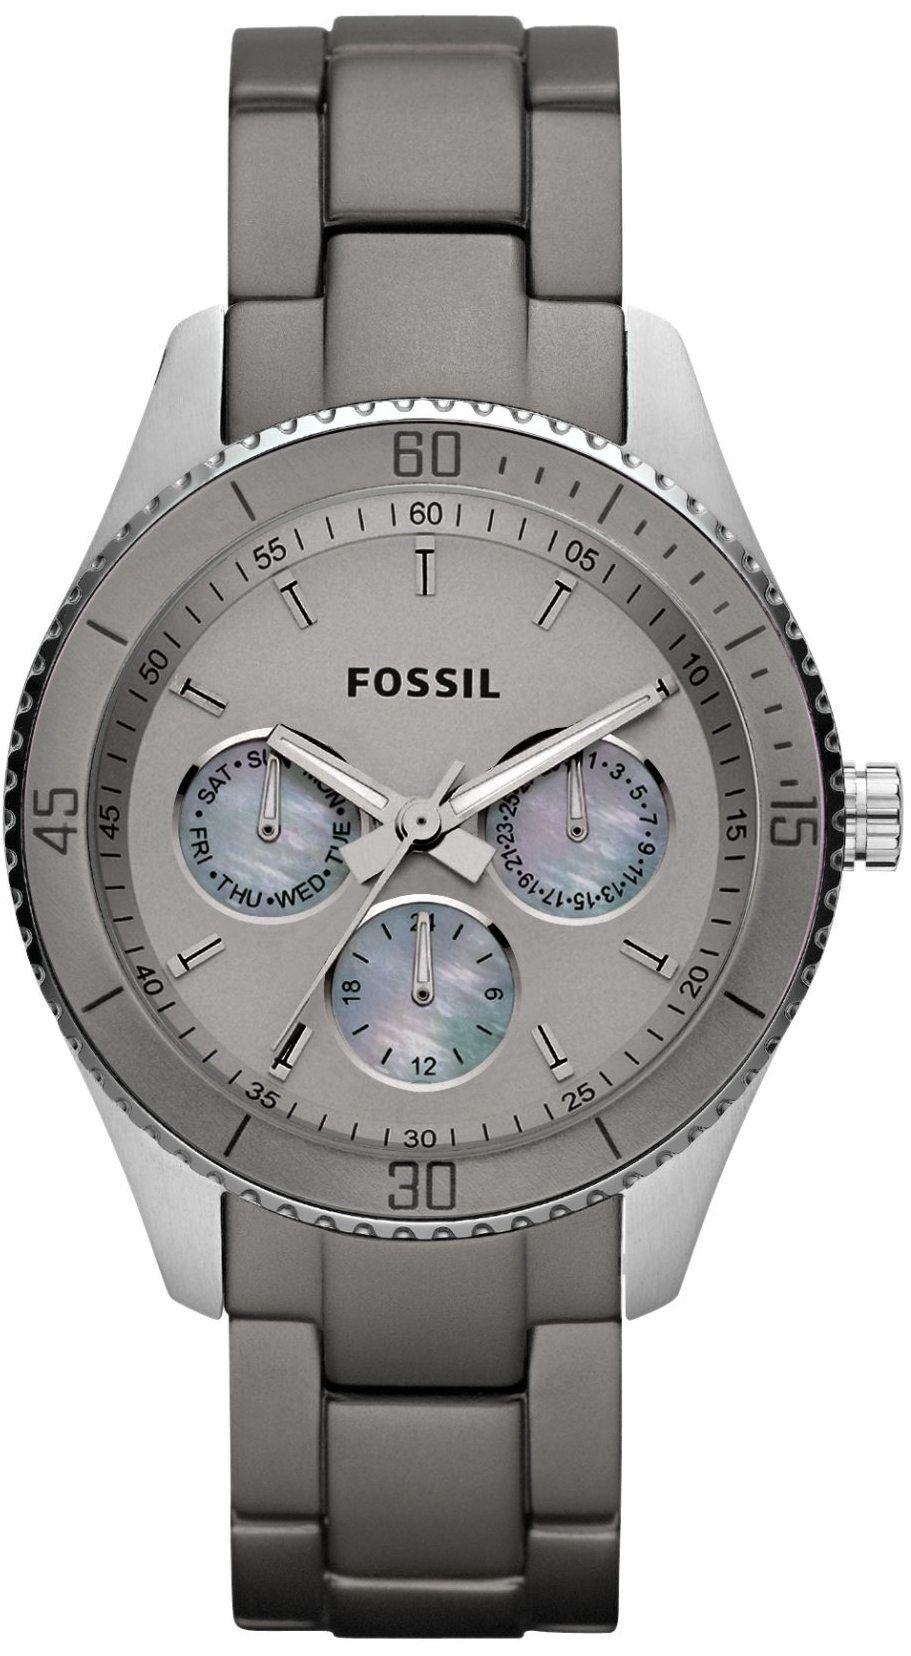 f8cc9ce23c4 Amazon.com  Fossil Women s ES3040 Stella Grey Aluminum and Stainless Steel  Watch  Fossil  Watches. Acessórios FemininosBijuteriasFemininaBelezaRelógios  ...